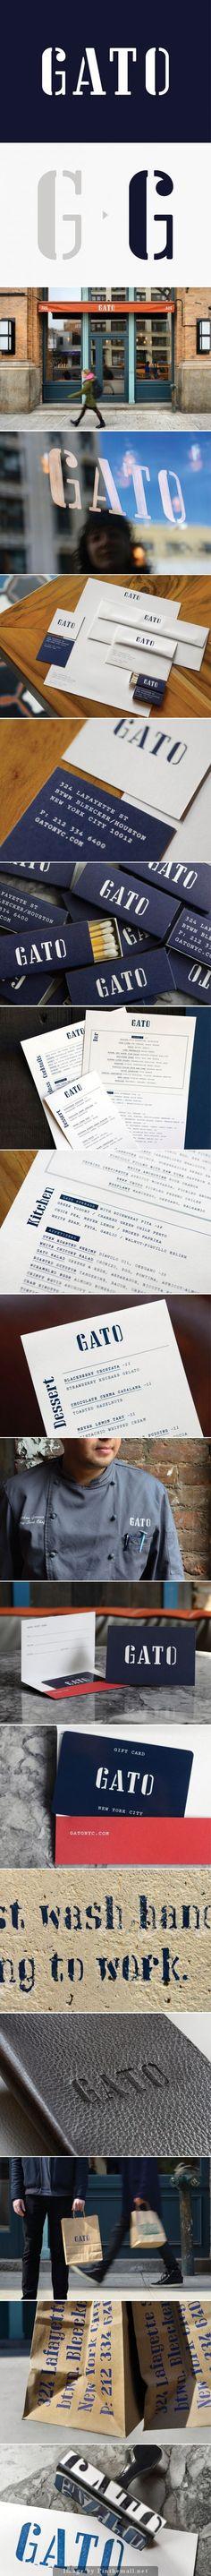 GATO | PENTAGRAM